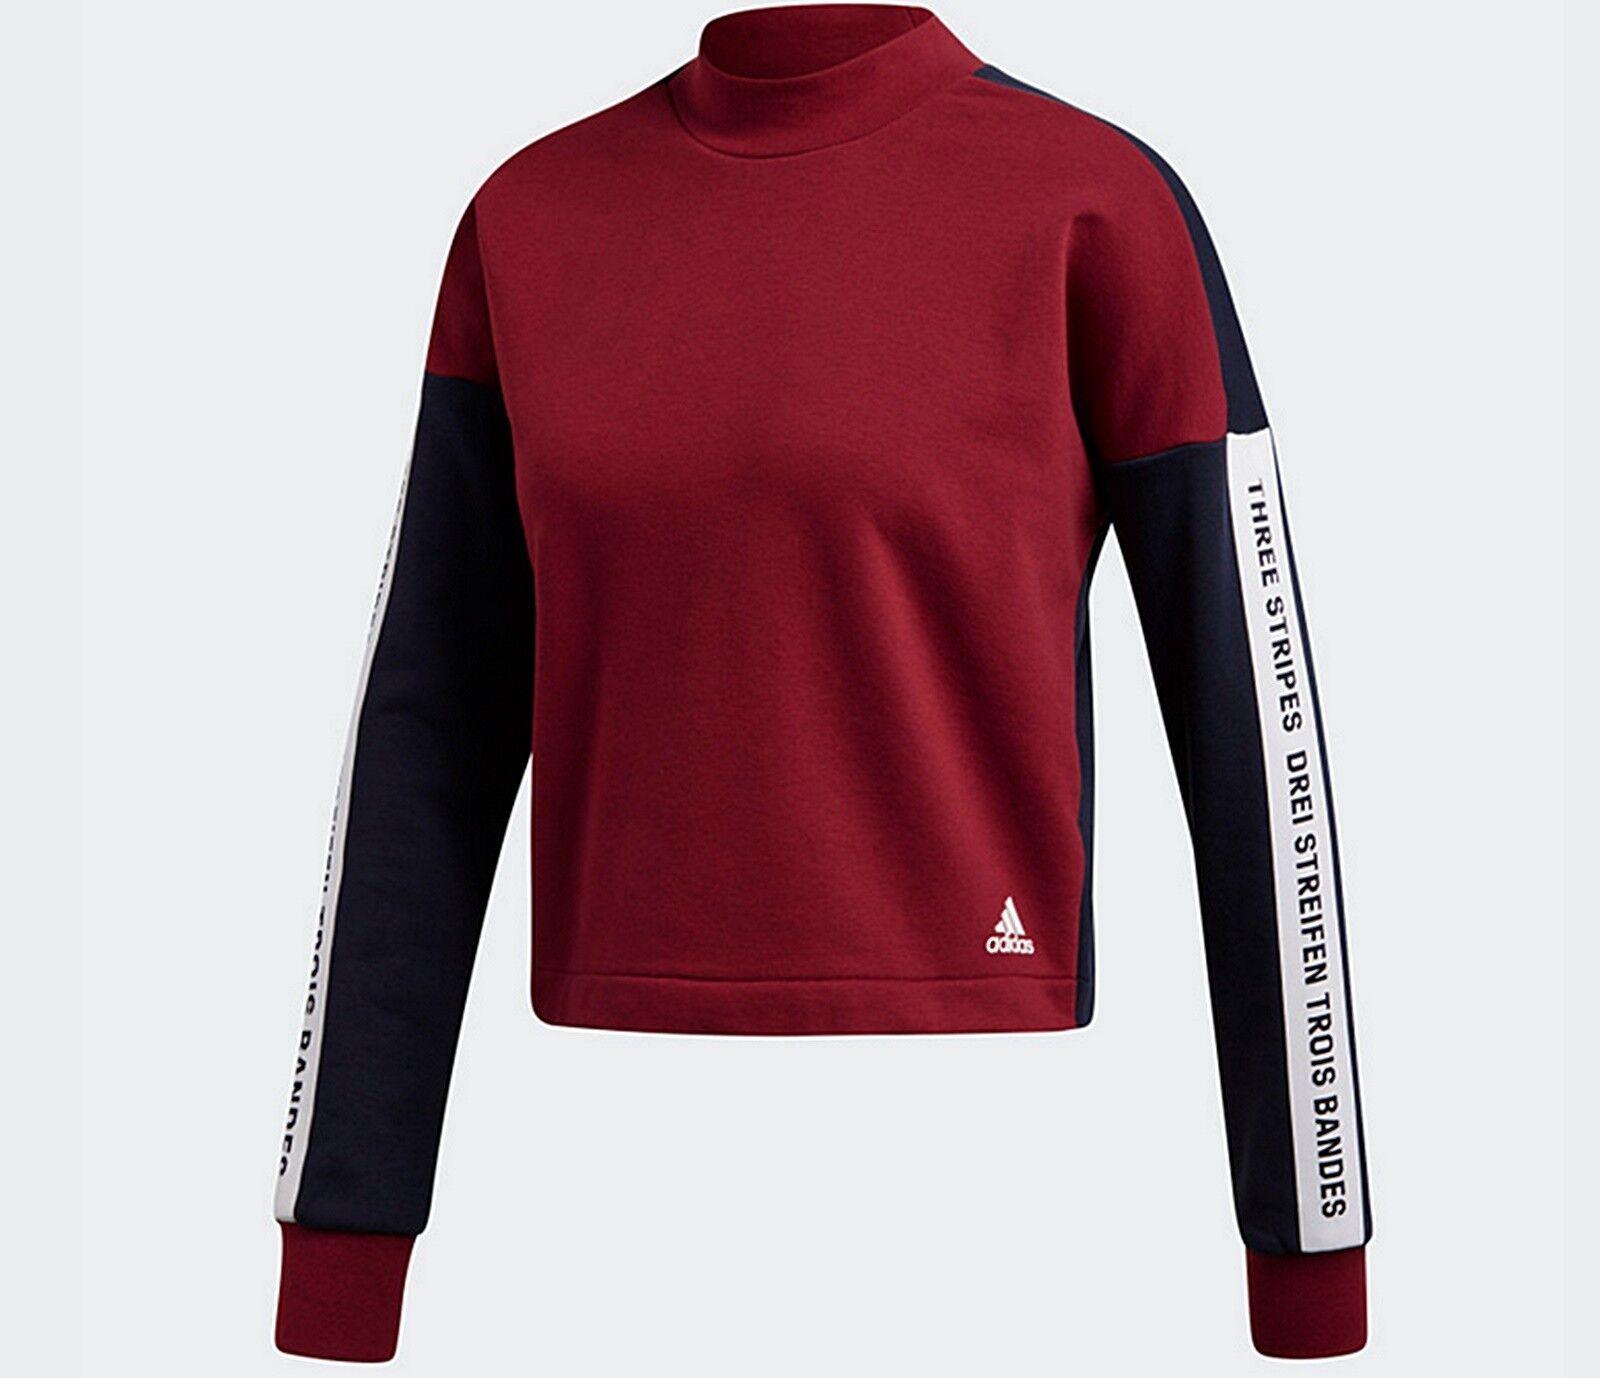 Adidas womens Athletics Sport ID Sweatshirt top brand with 3 stripes print NEW M